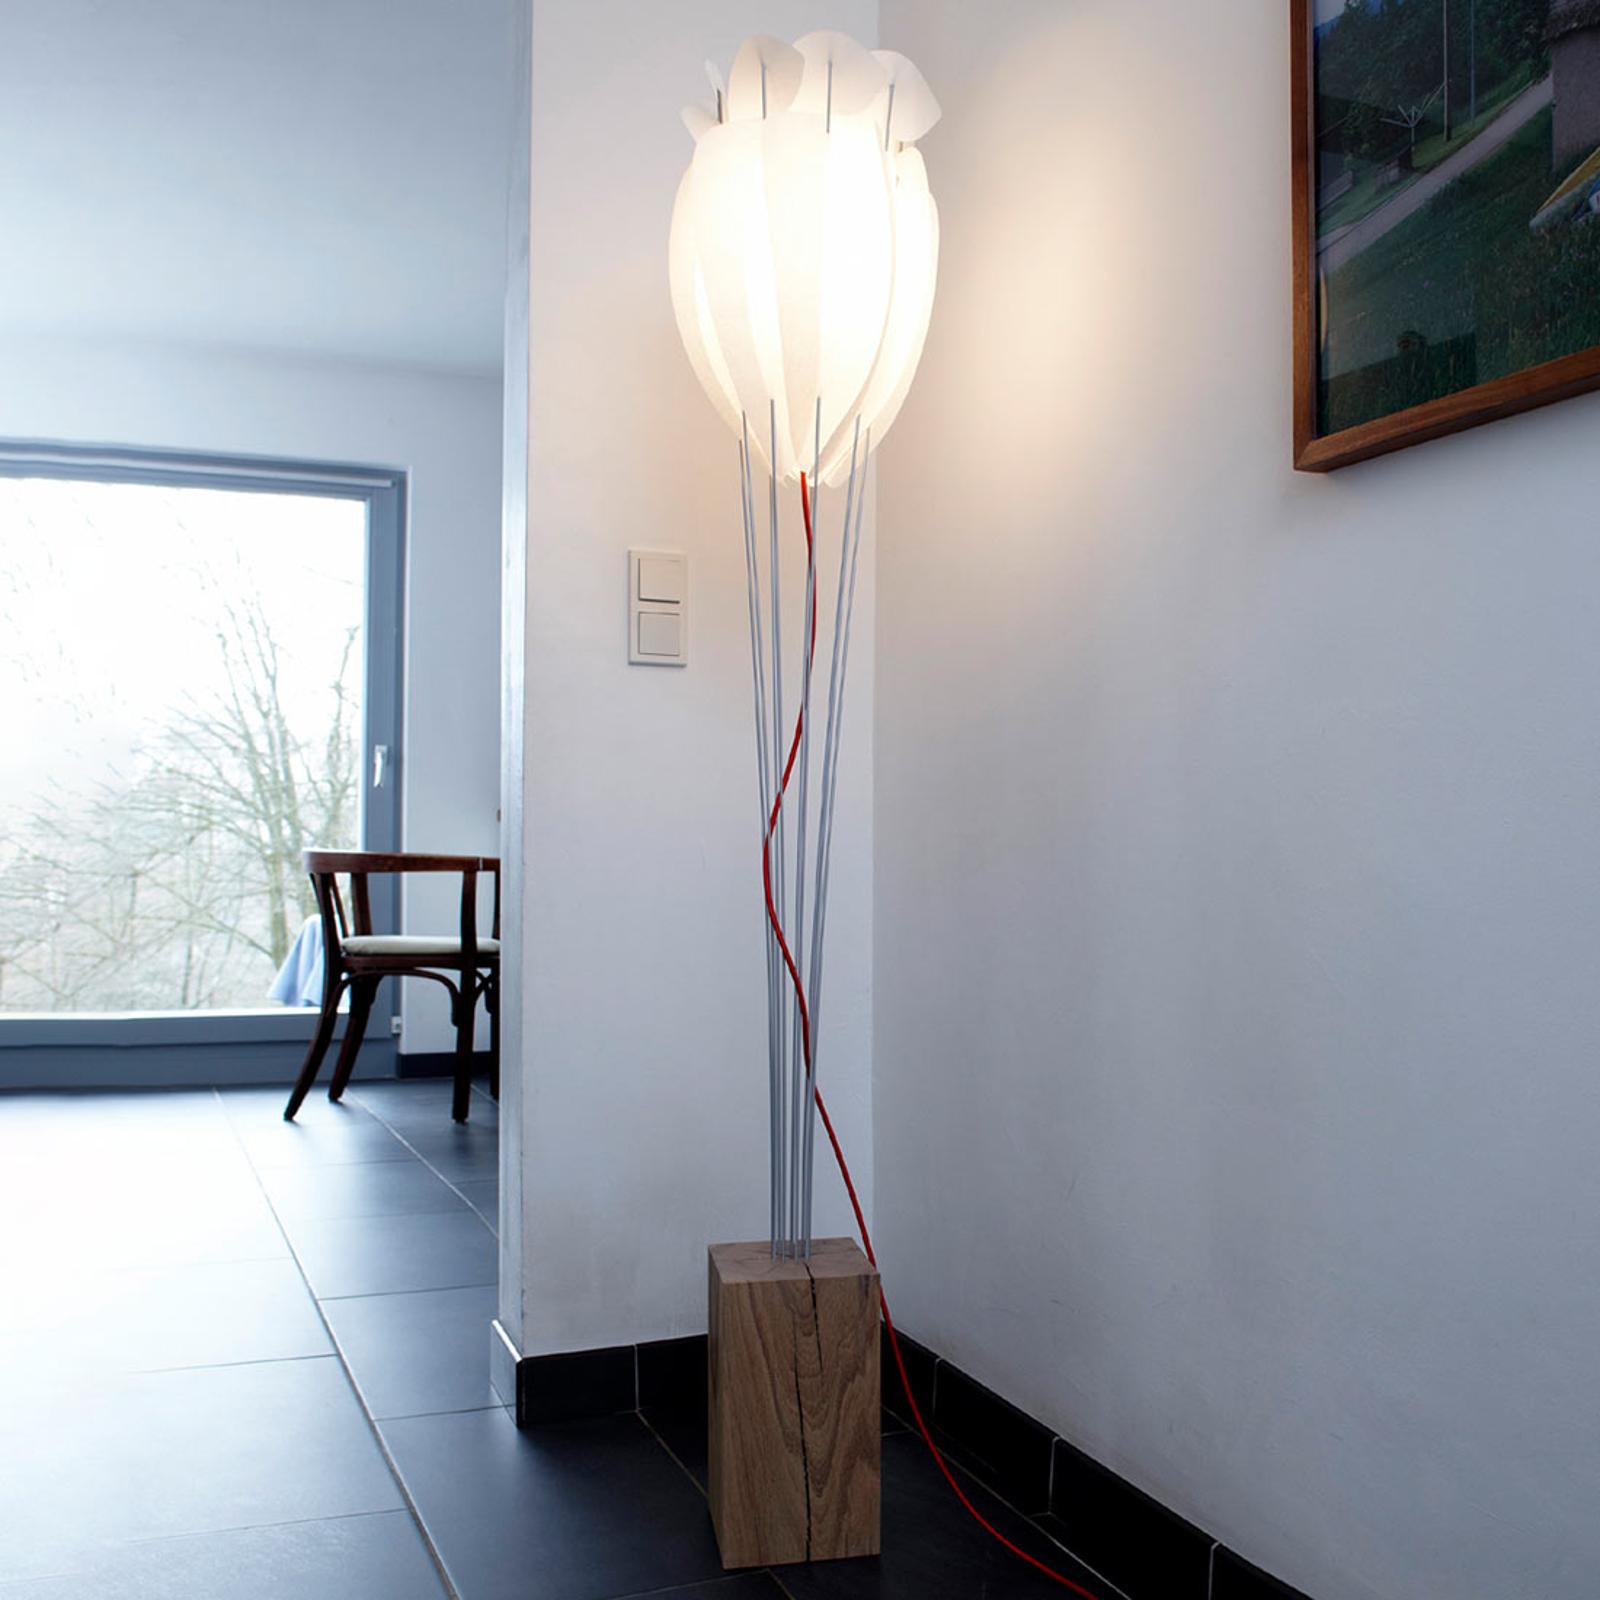 Vloerlamp Tulip rood kabel eiken wit